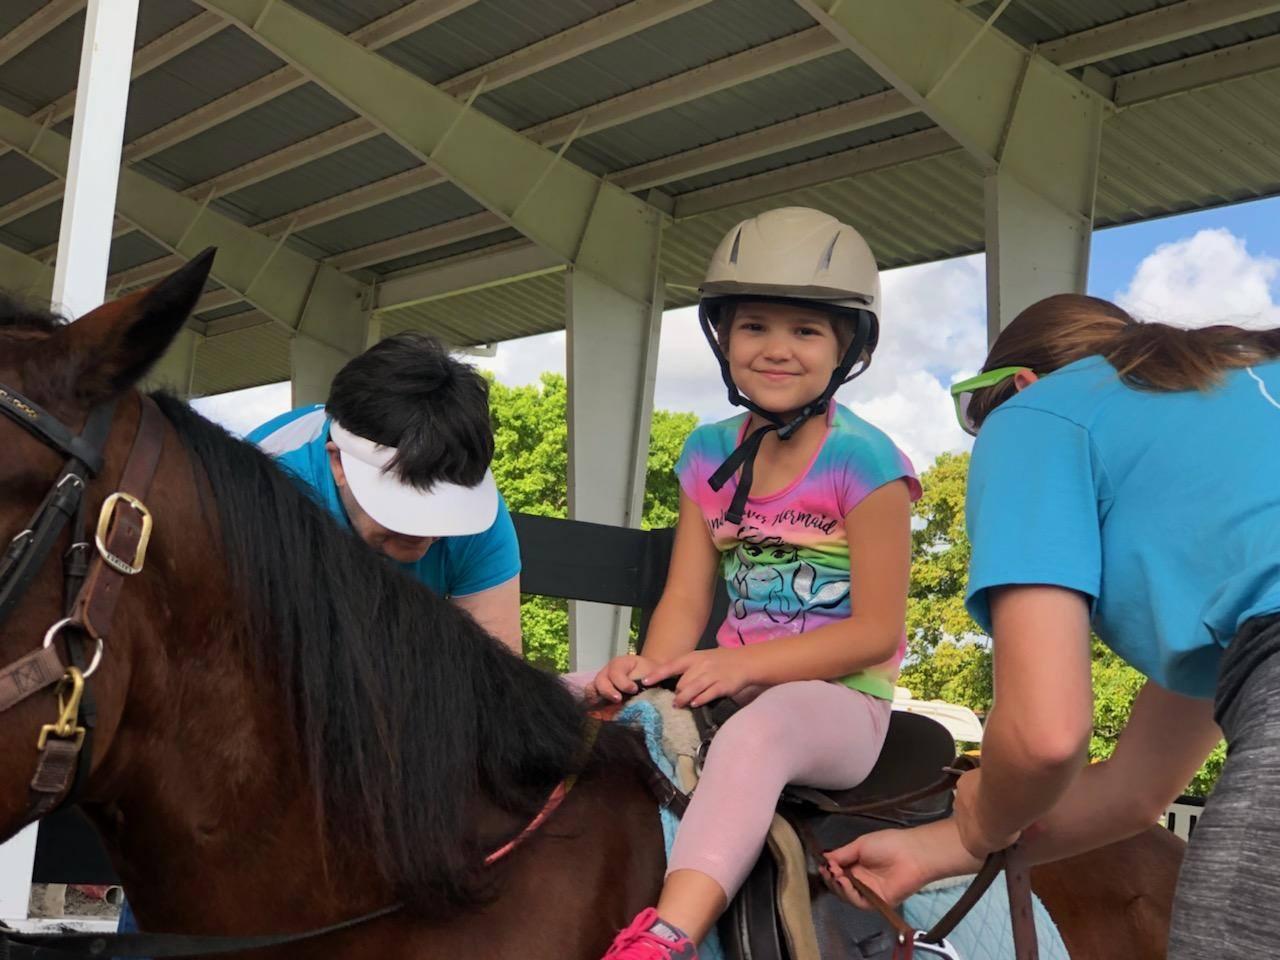 Mia on horse